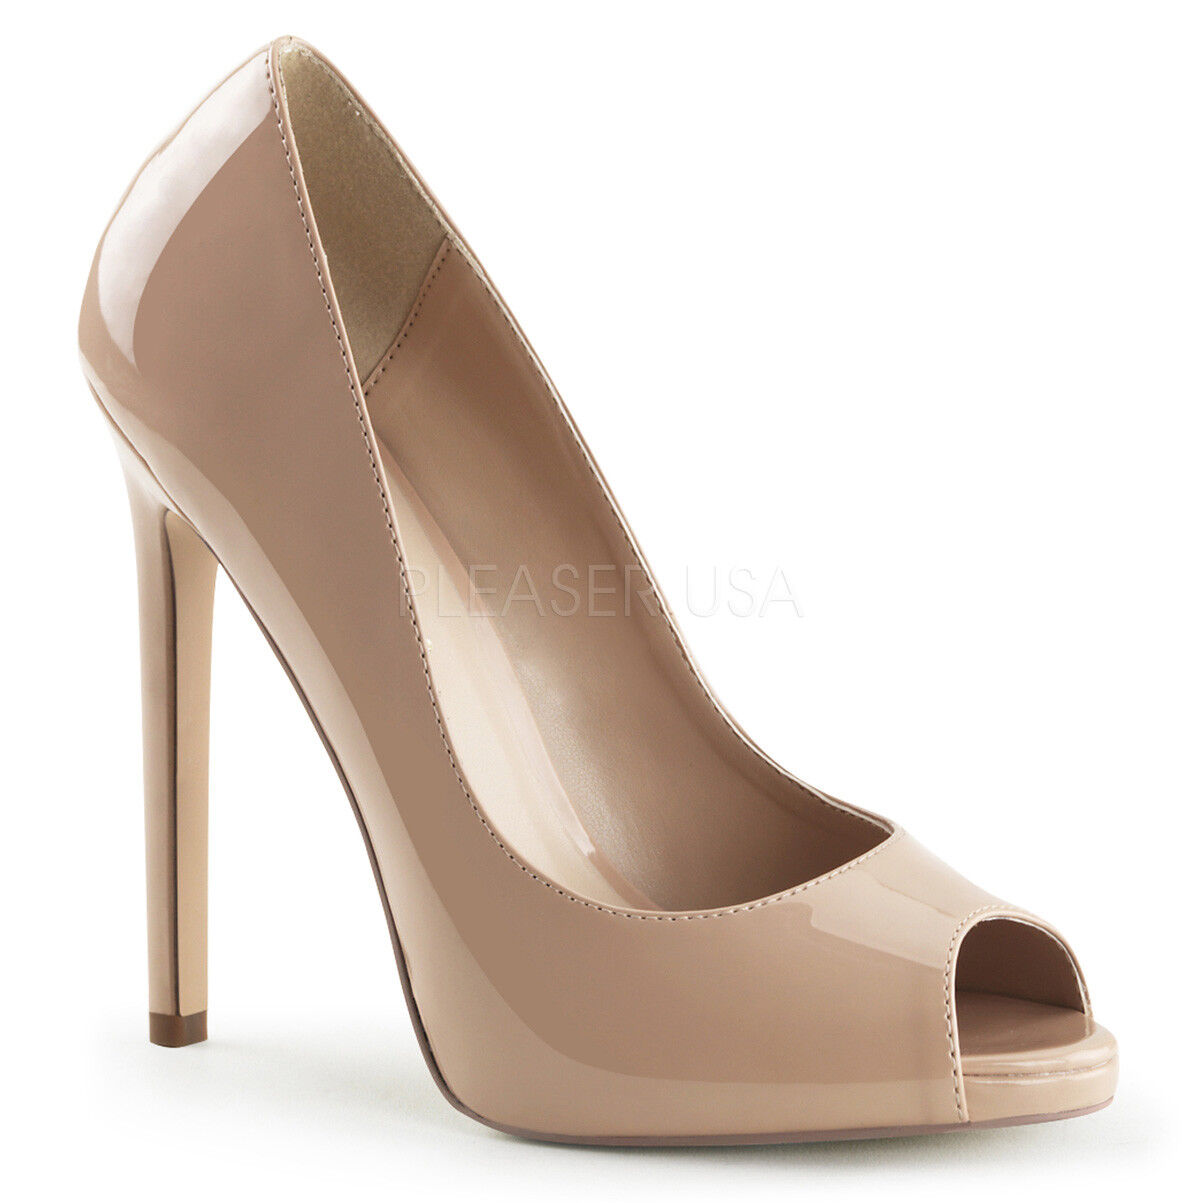 PLEASER SEXY-42 NUDE PATENT HIGH PEEP-TOE STILETTO HIGH PATENT HEEL COURT Schuhe b399fd